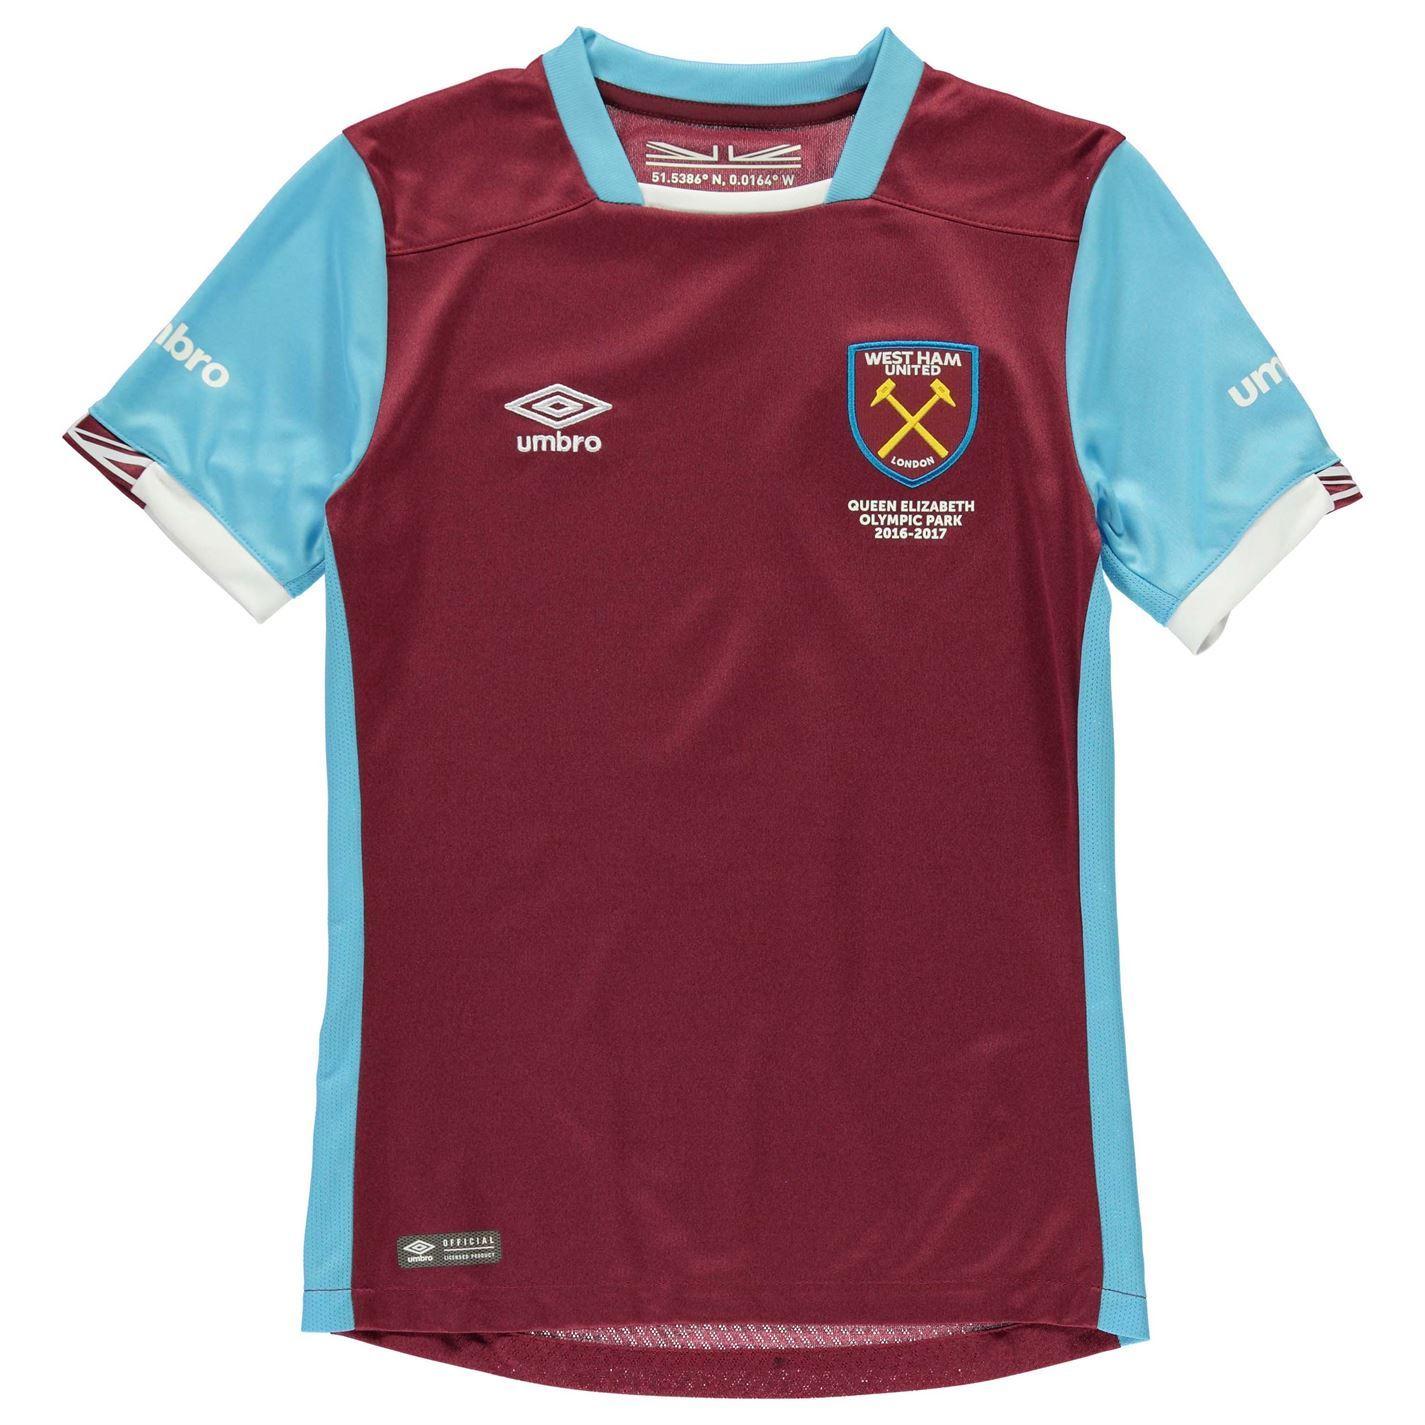 Umbro West Ham United Fc Home Jersey   Juniors Football Soccer